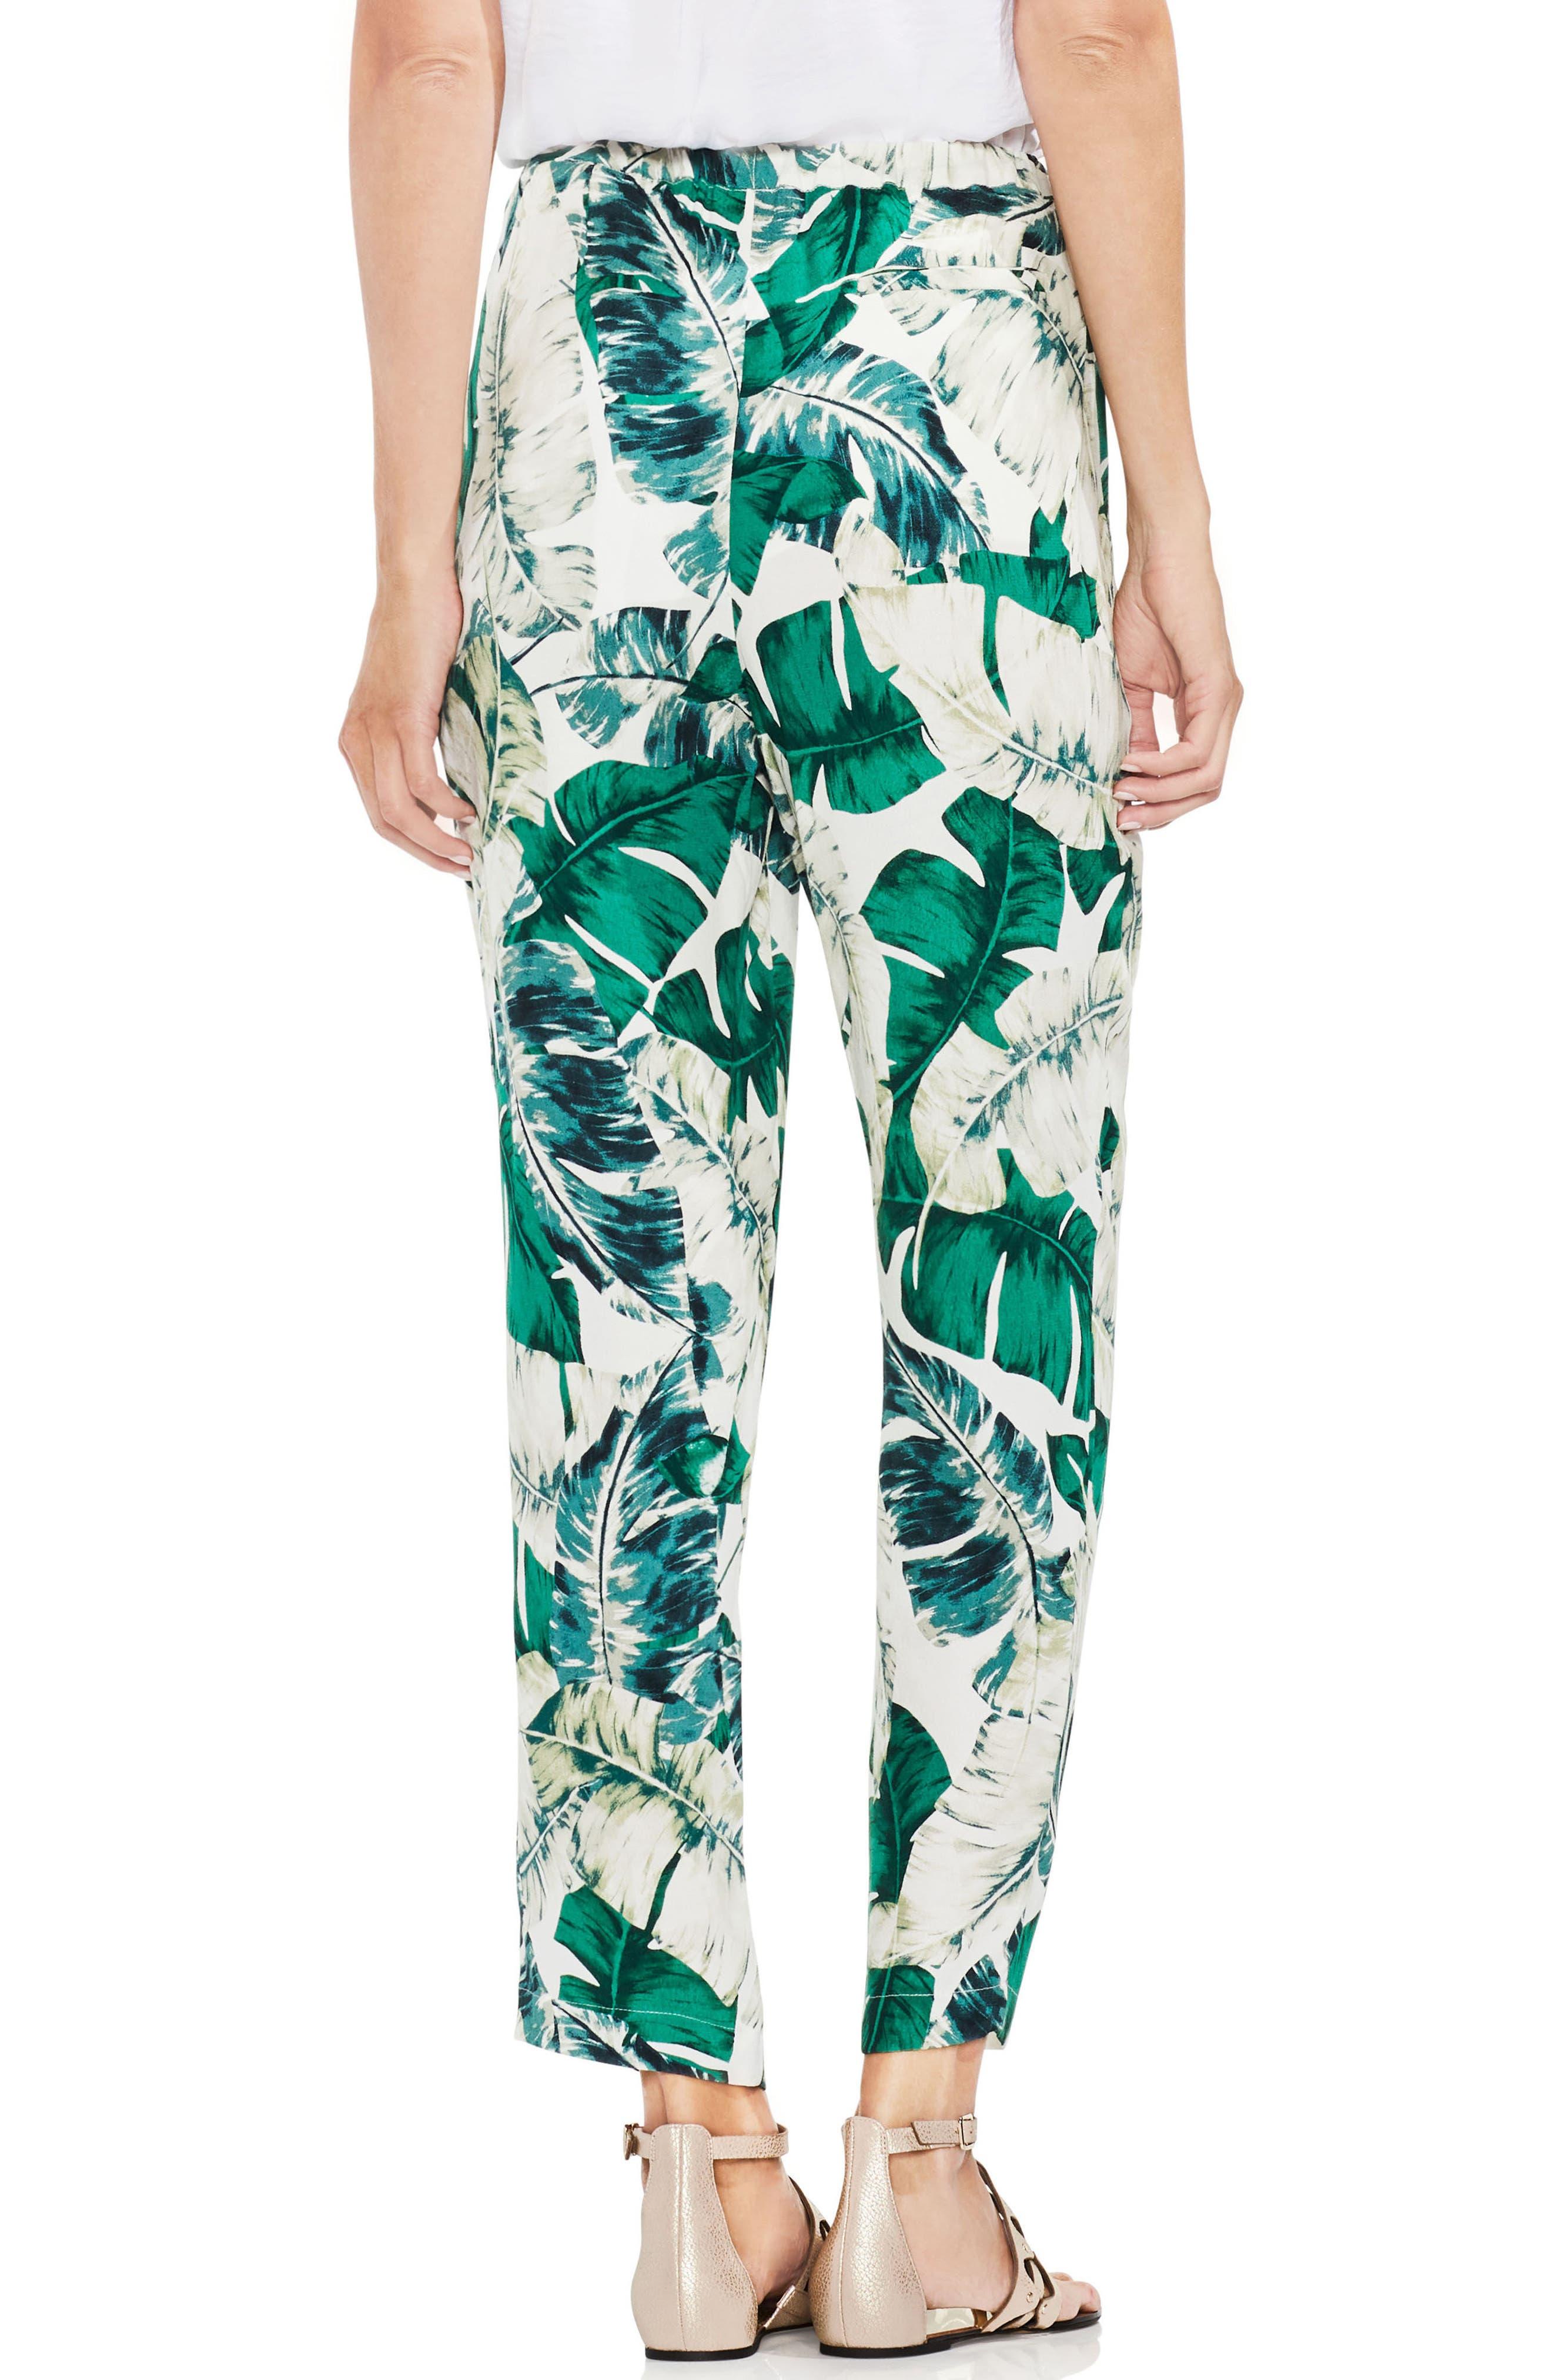 VINCE CAMUTO,                             Jungle Palm Print Slim Leg Pants,                             Alternate thumbnail 2, color,                             103